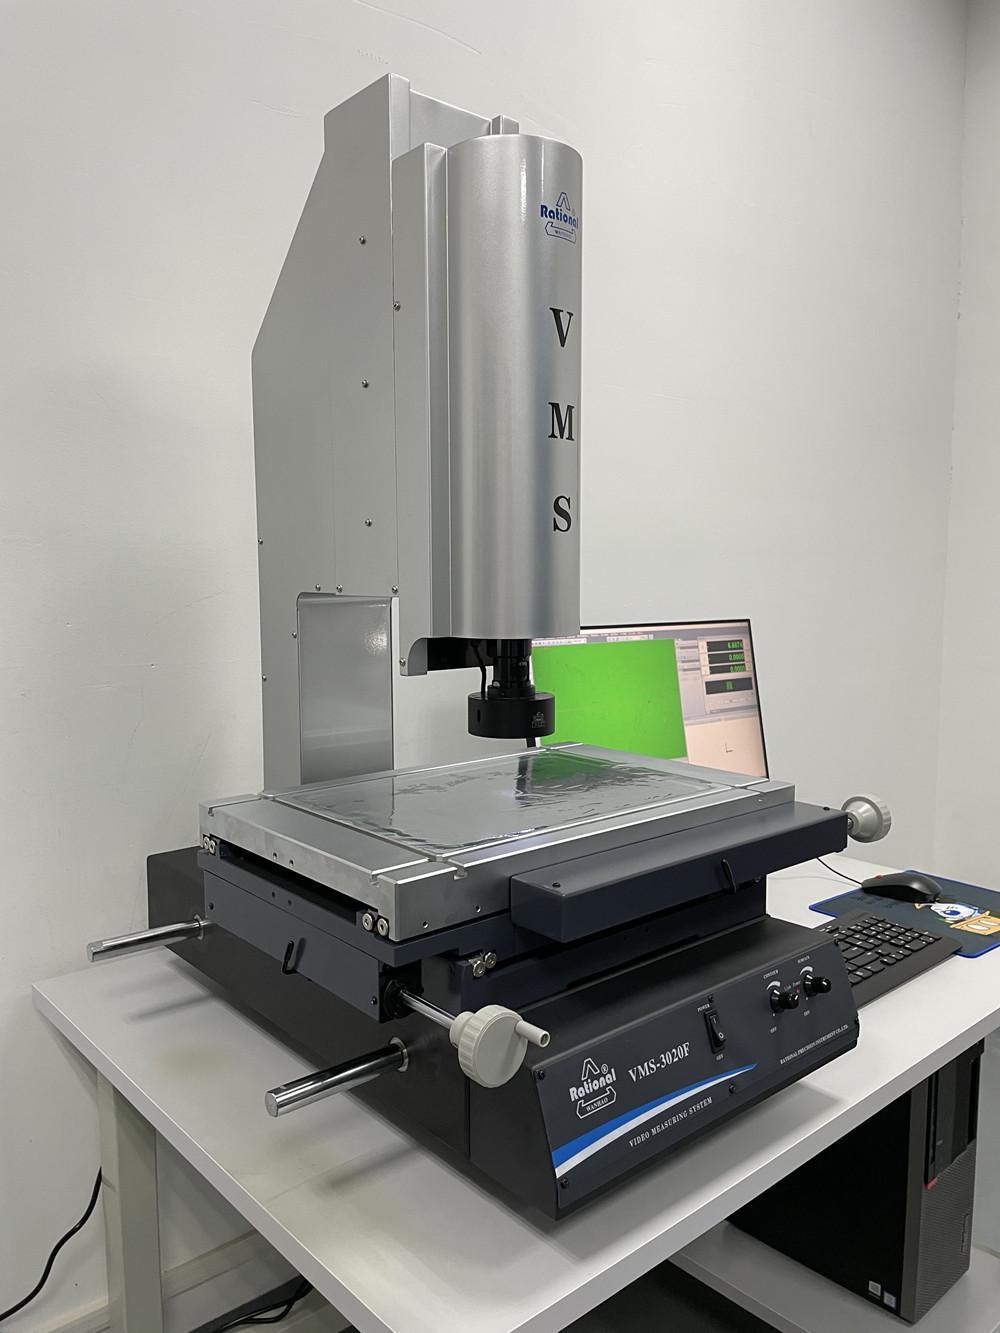 二次元VMS-3020F 2